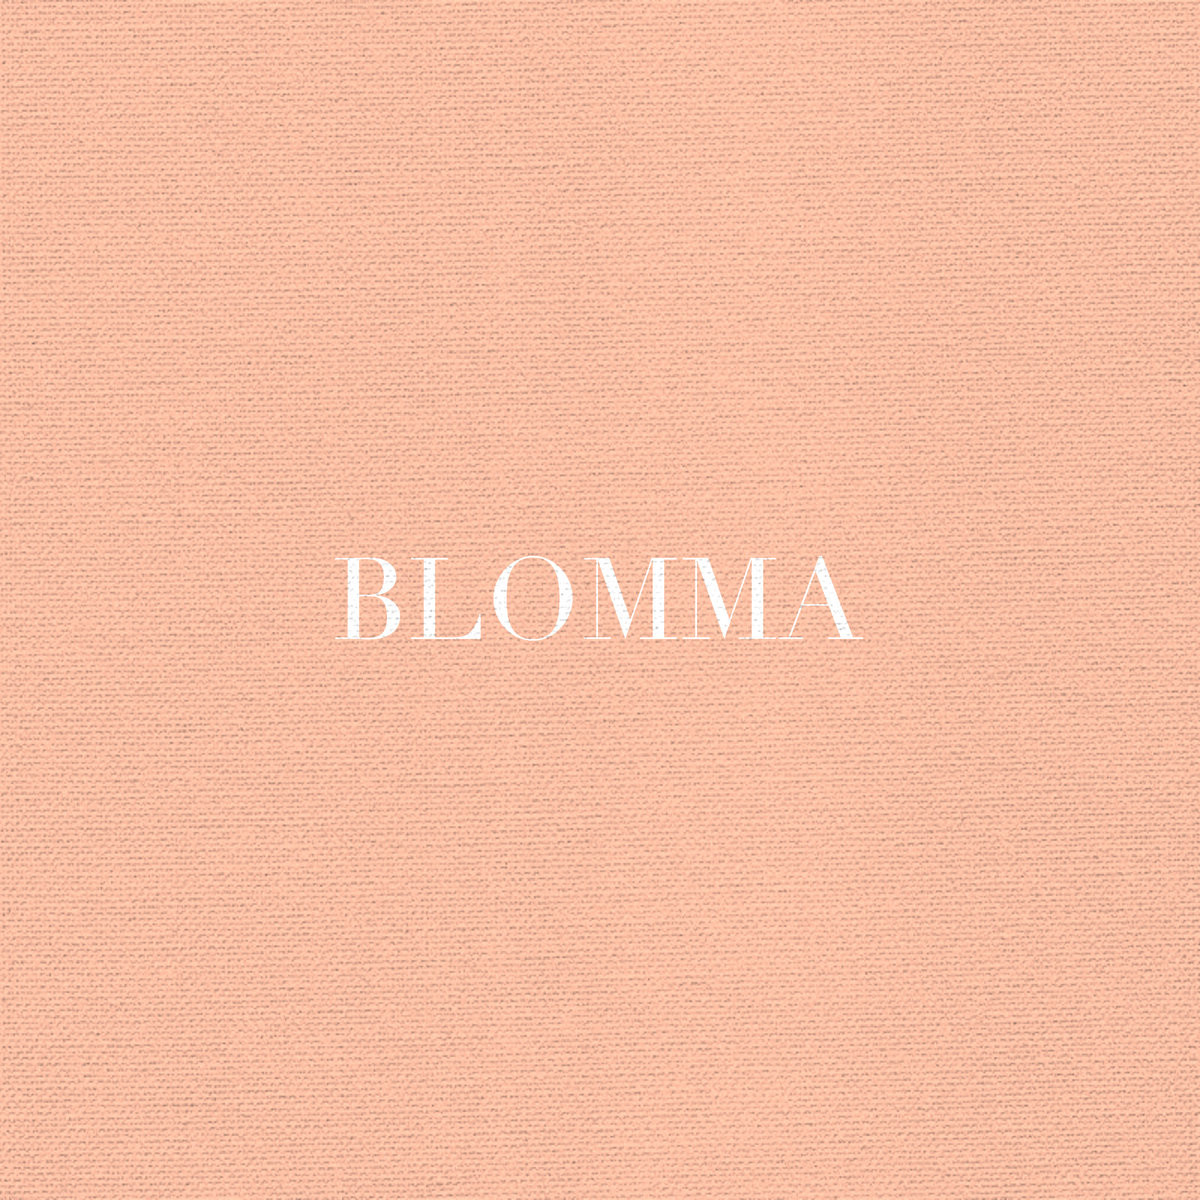 blomma blomma album